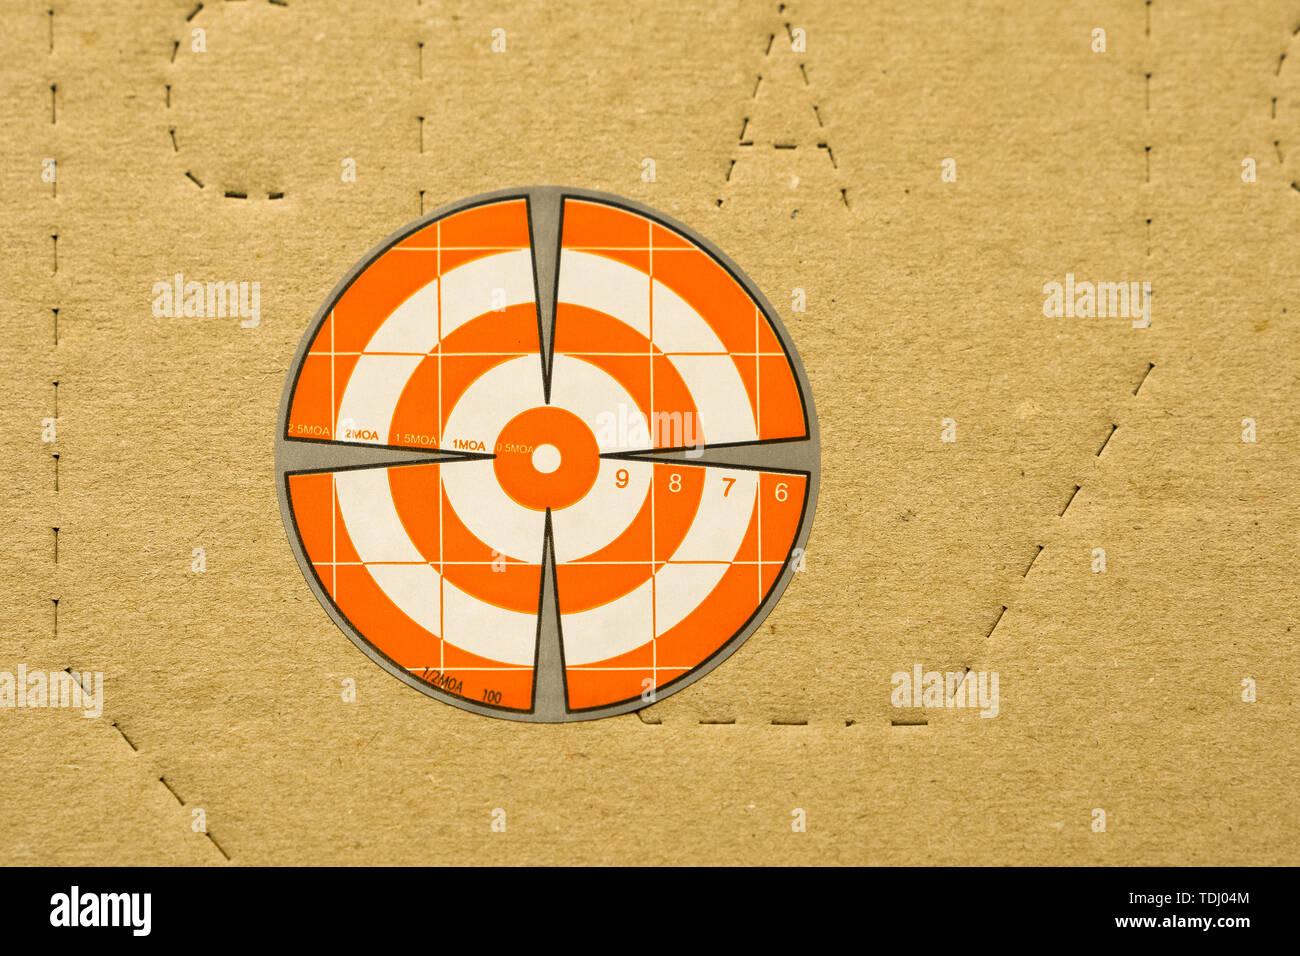 Paper orange target for shooting on IDPA target background - Stock Image